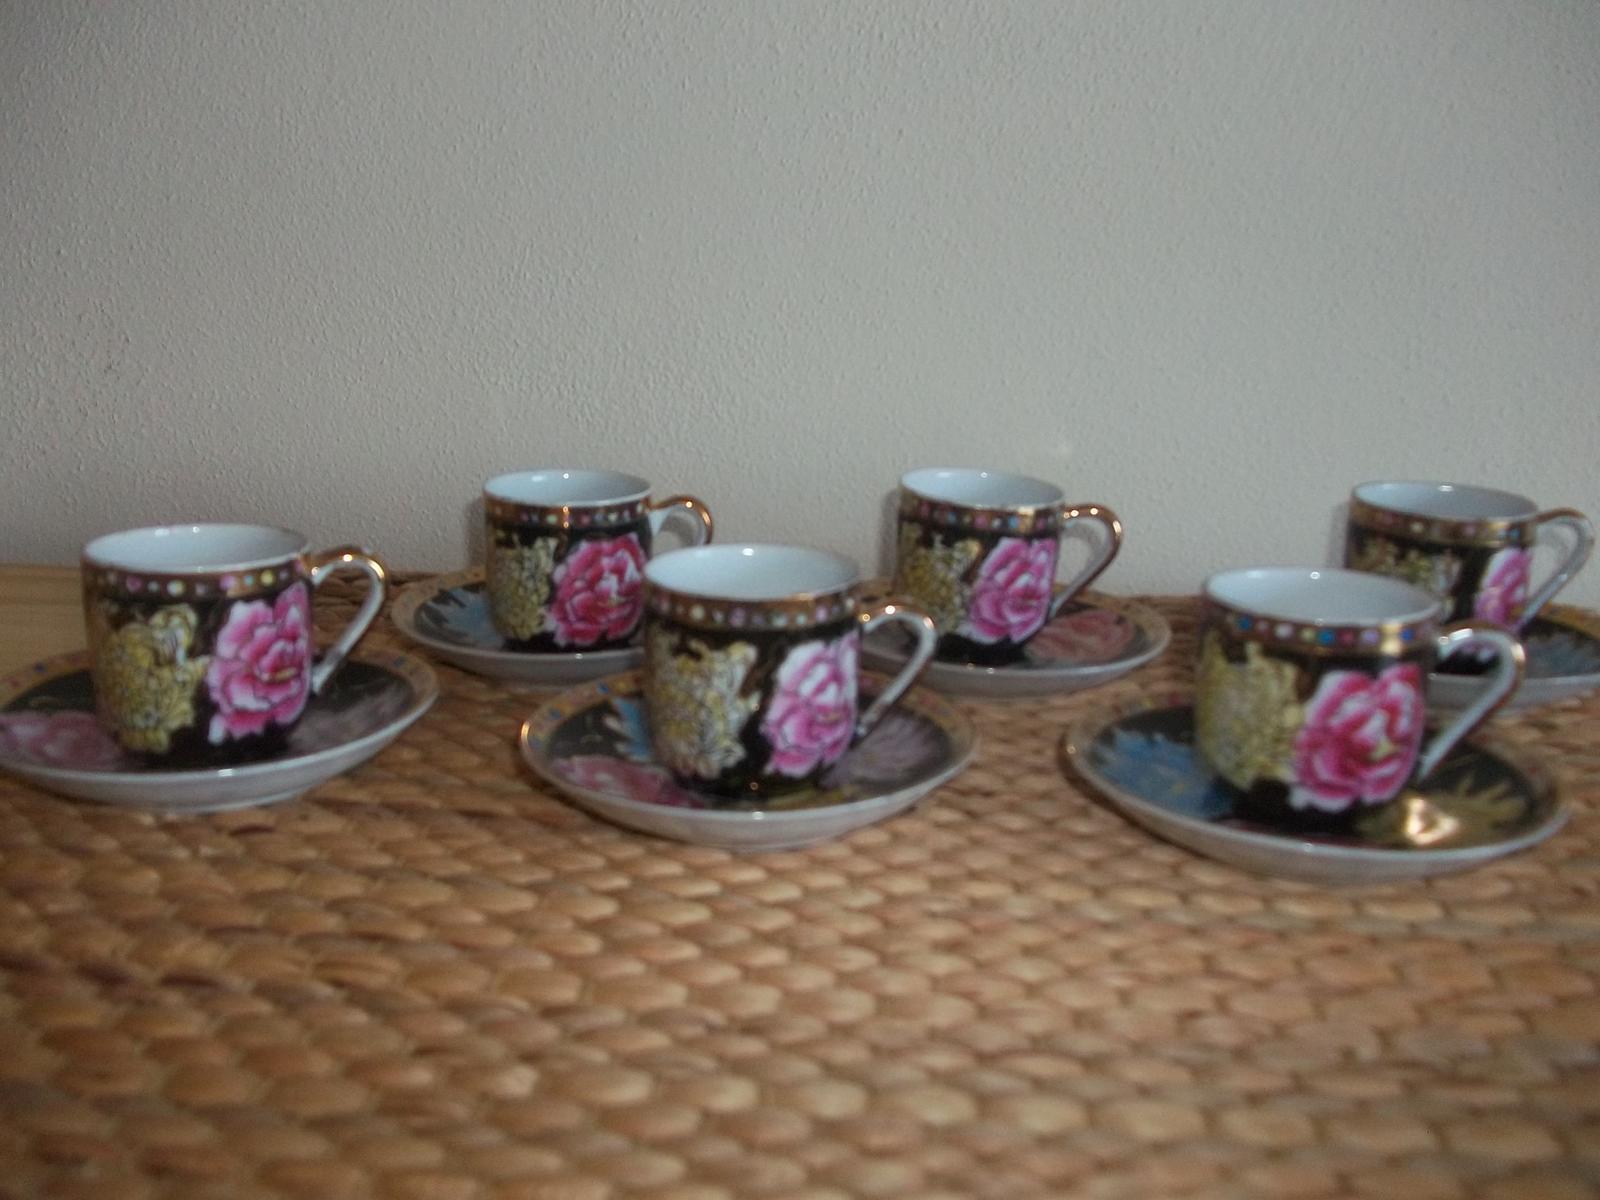 Staručké šálky z čínskeho porcelánu - Obrázok č. 2